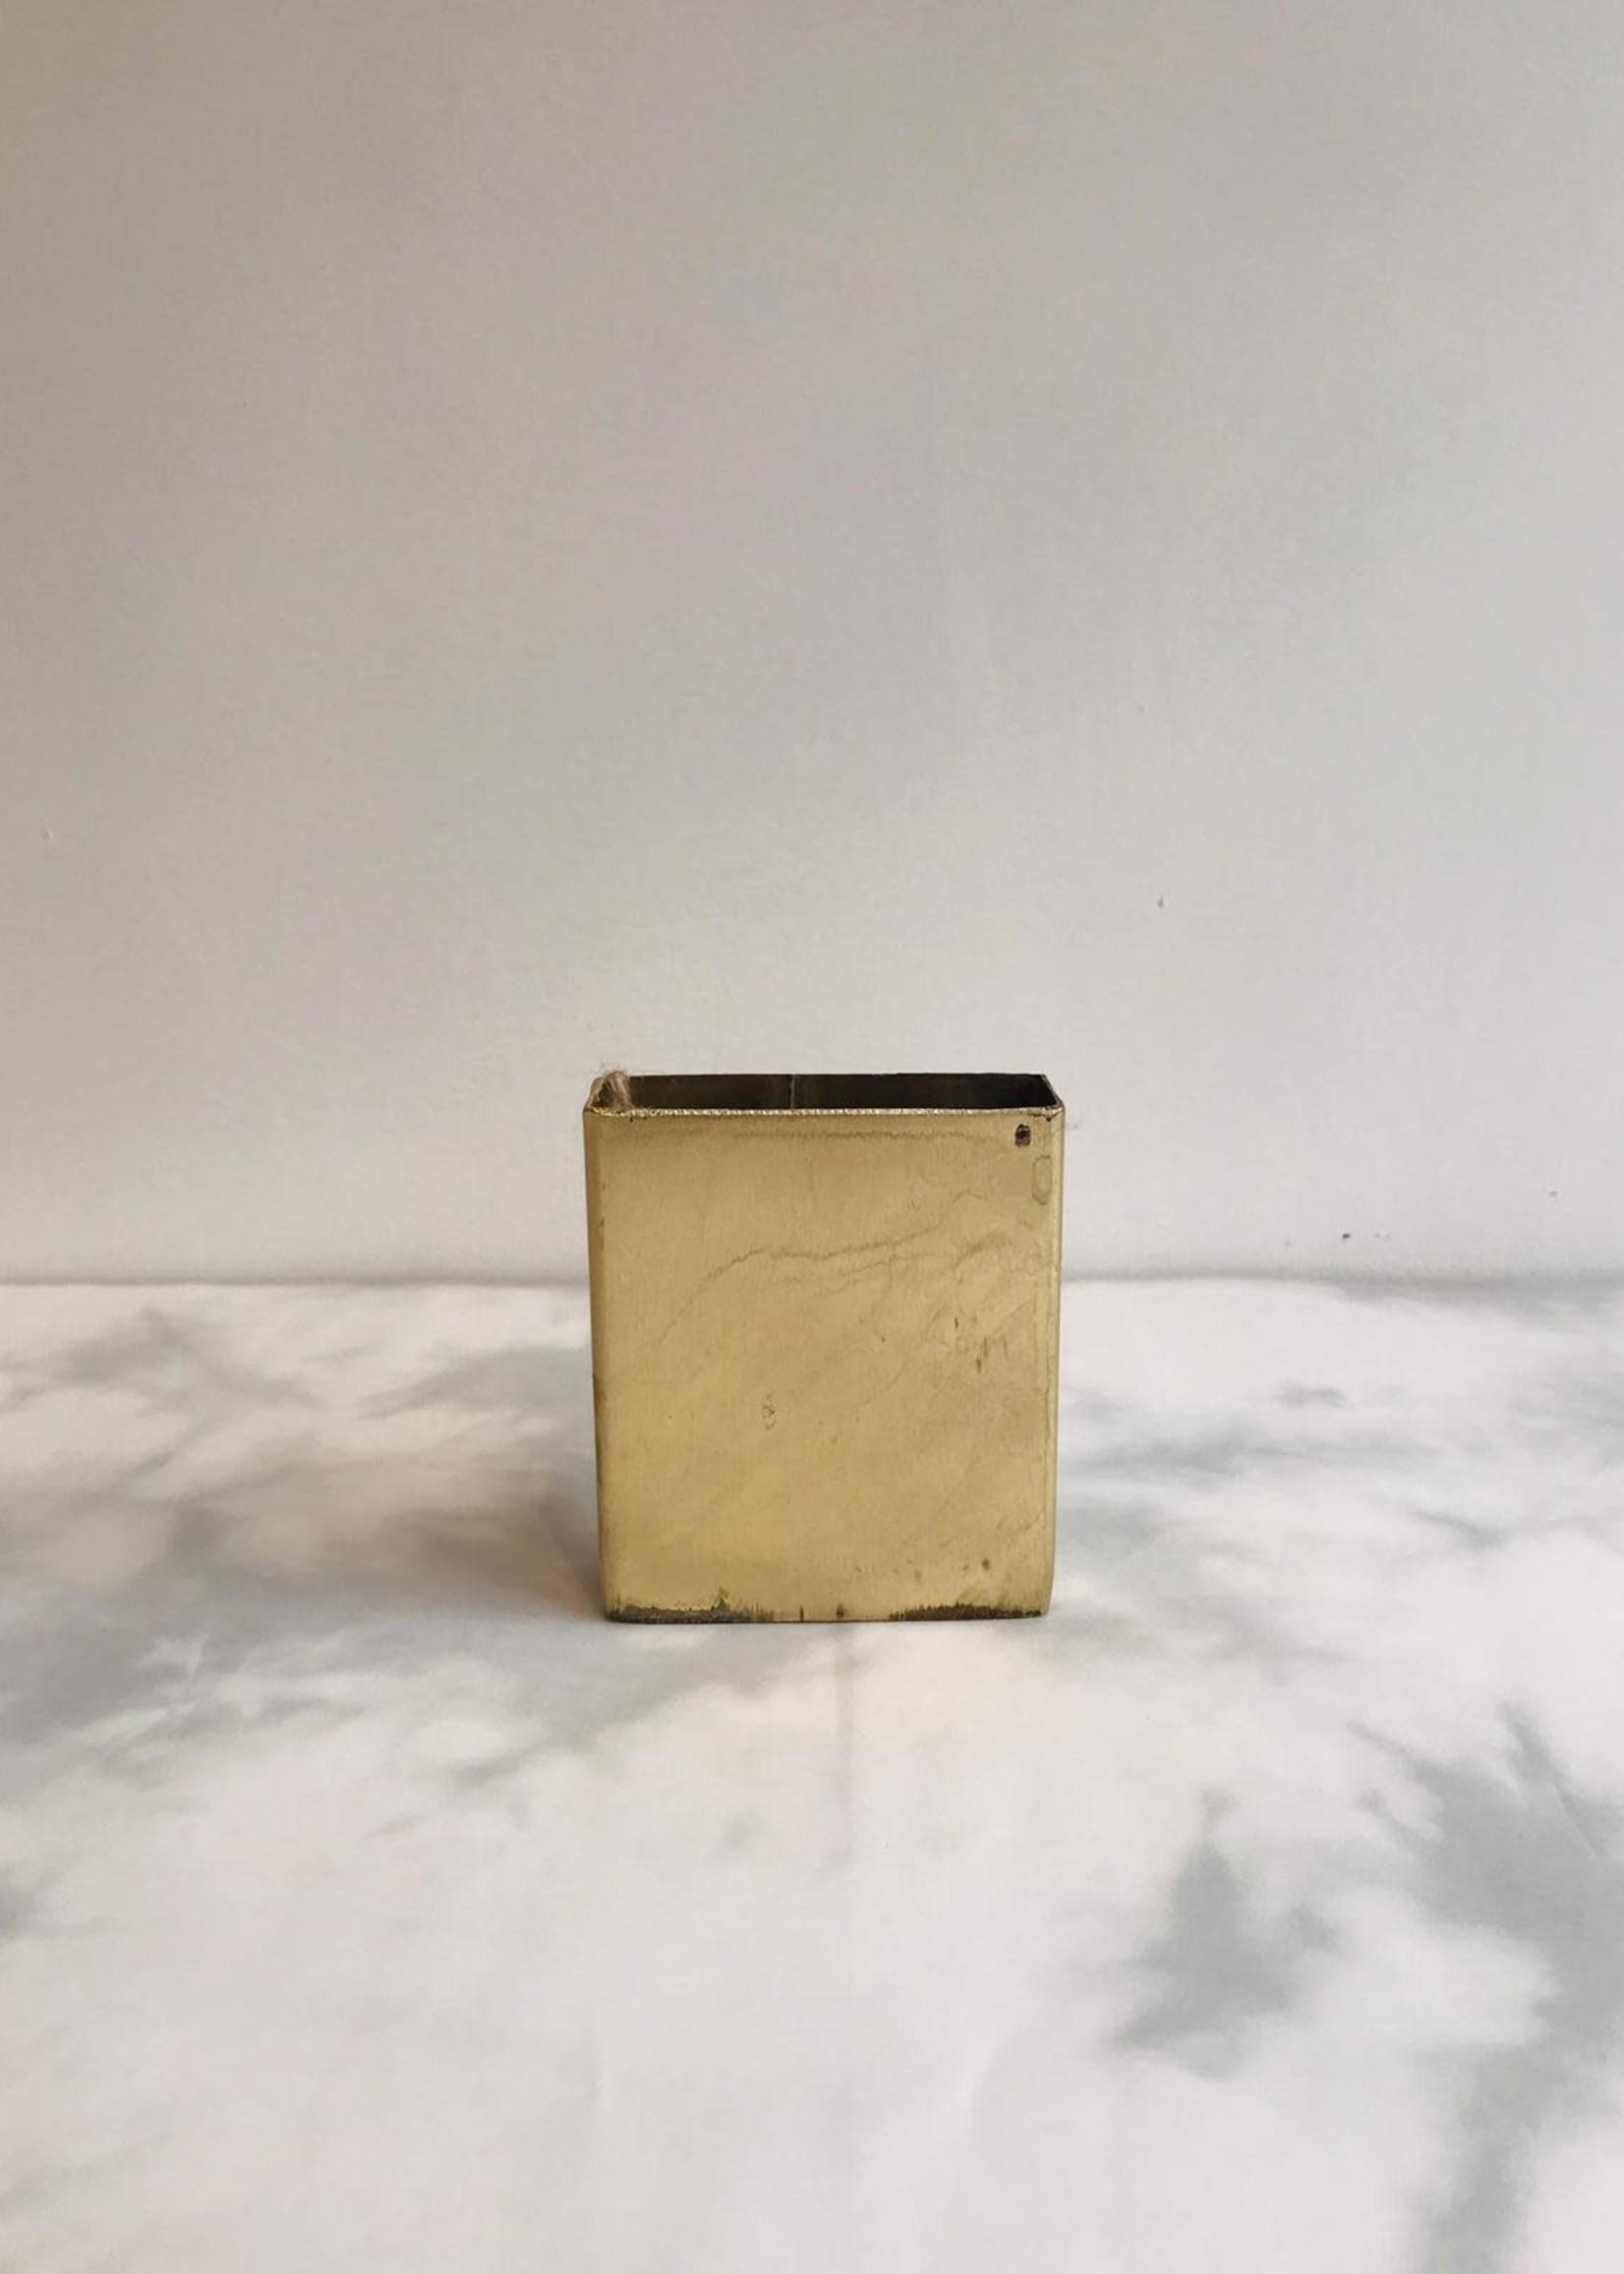 Naman Project Vaas POCKET metaal GOUD 7.5x2.5x8cm